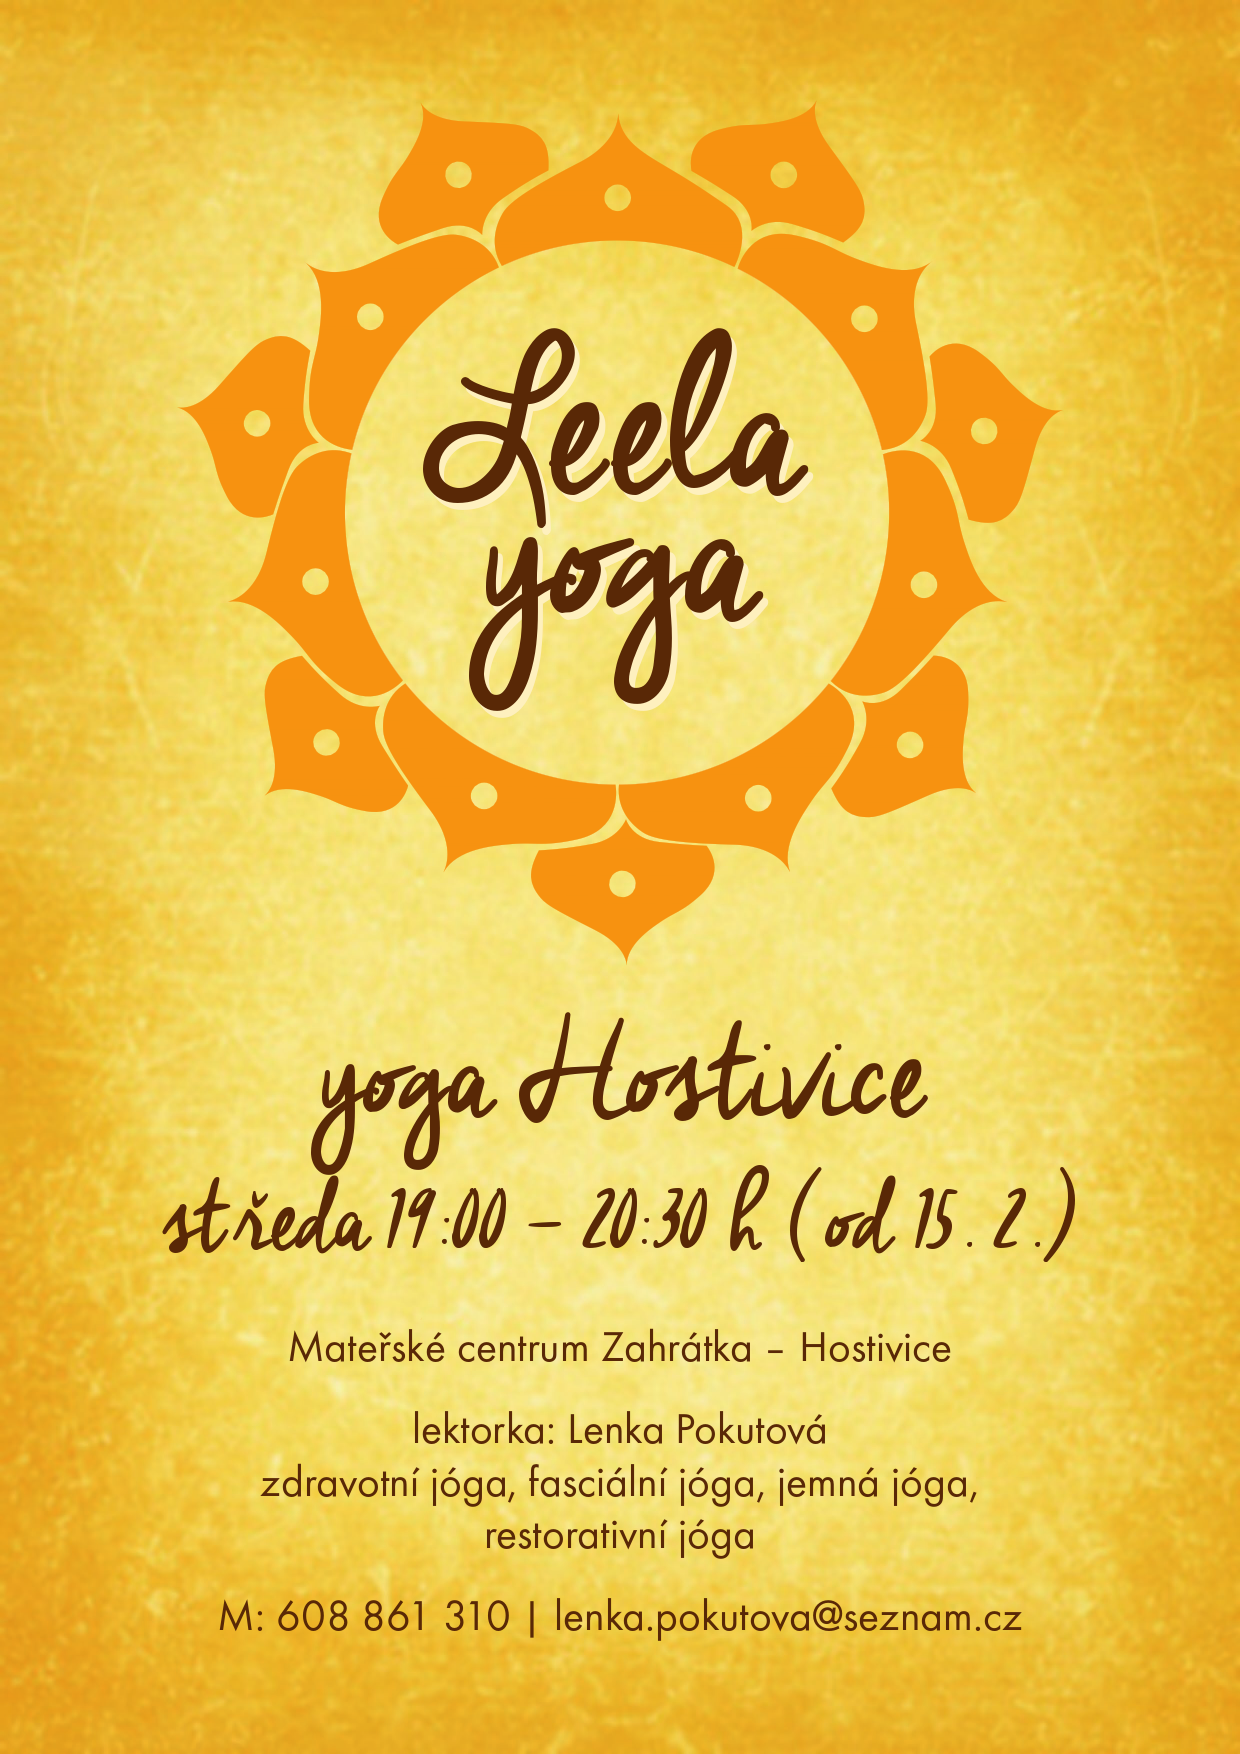 Letacek_yoga_Hostivice.pdf-000001